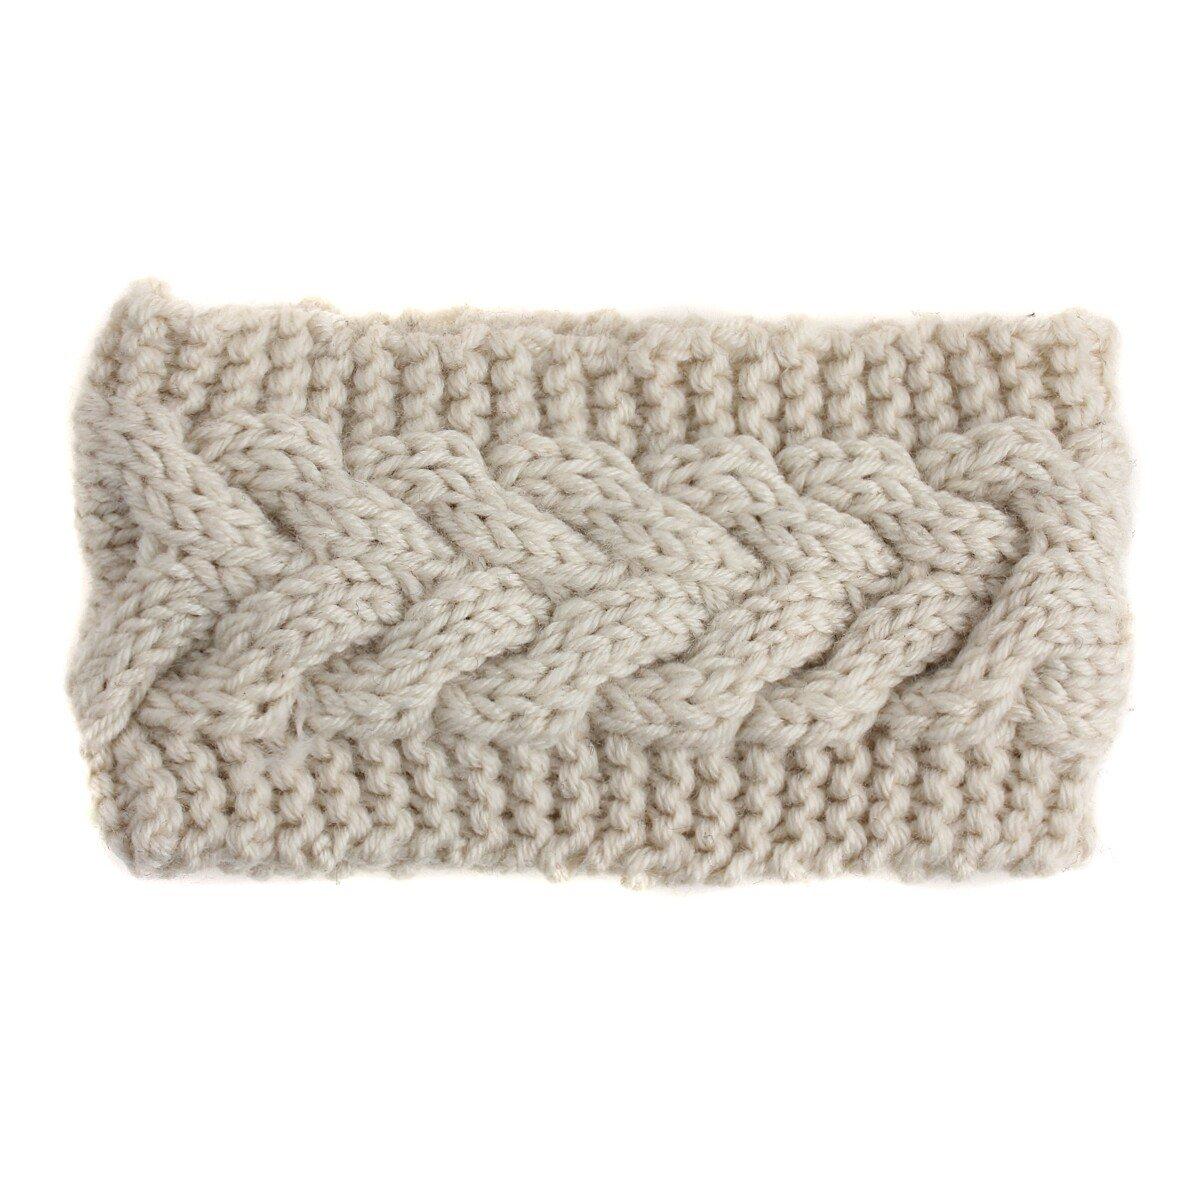 Amazon.com : Eforstore Twist Wave Wool Knitted Women Lady Hat ...